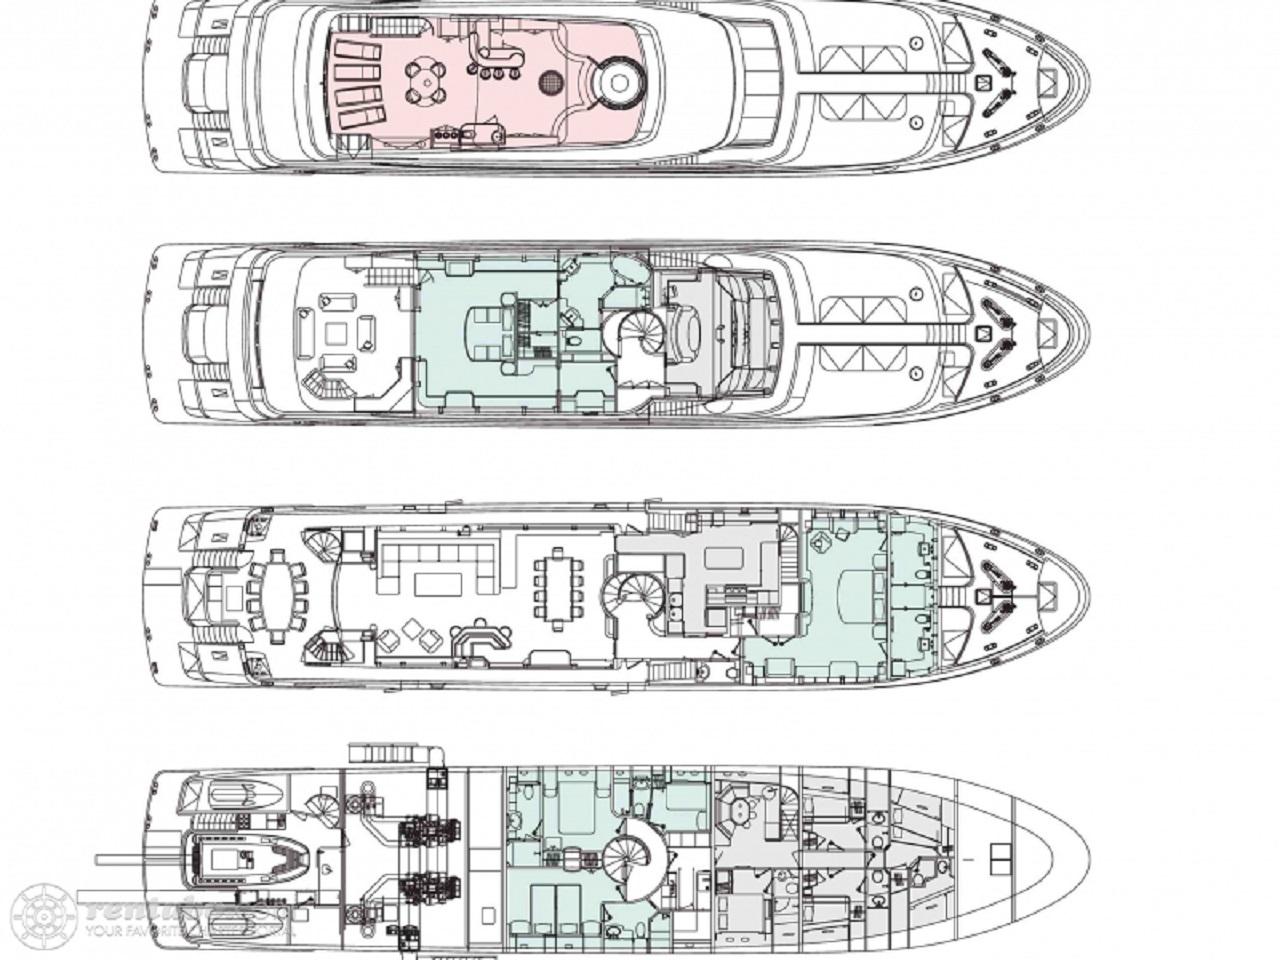 Luxury Charter Yacht Lady Leila Specs